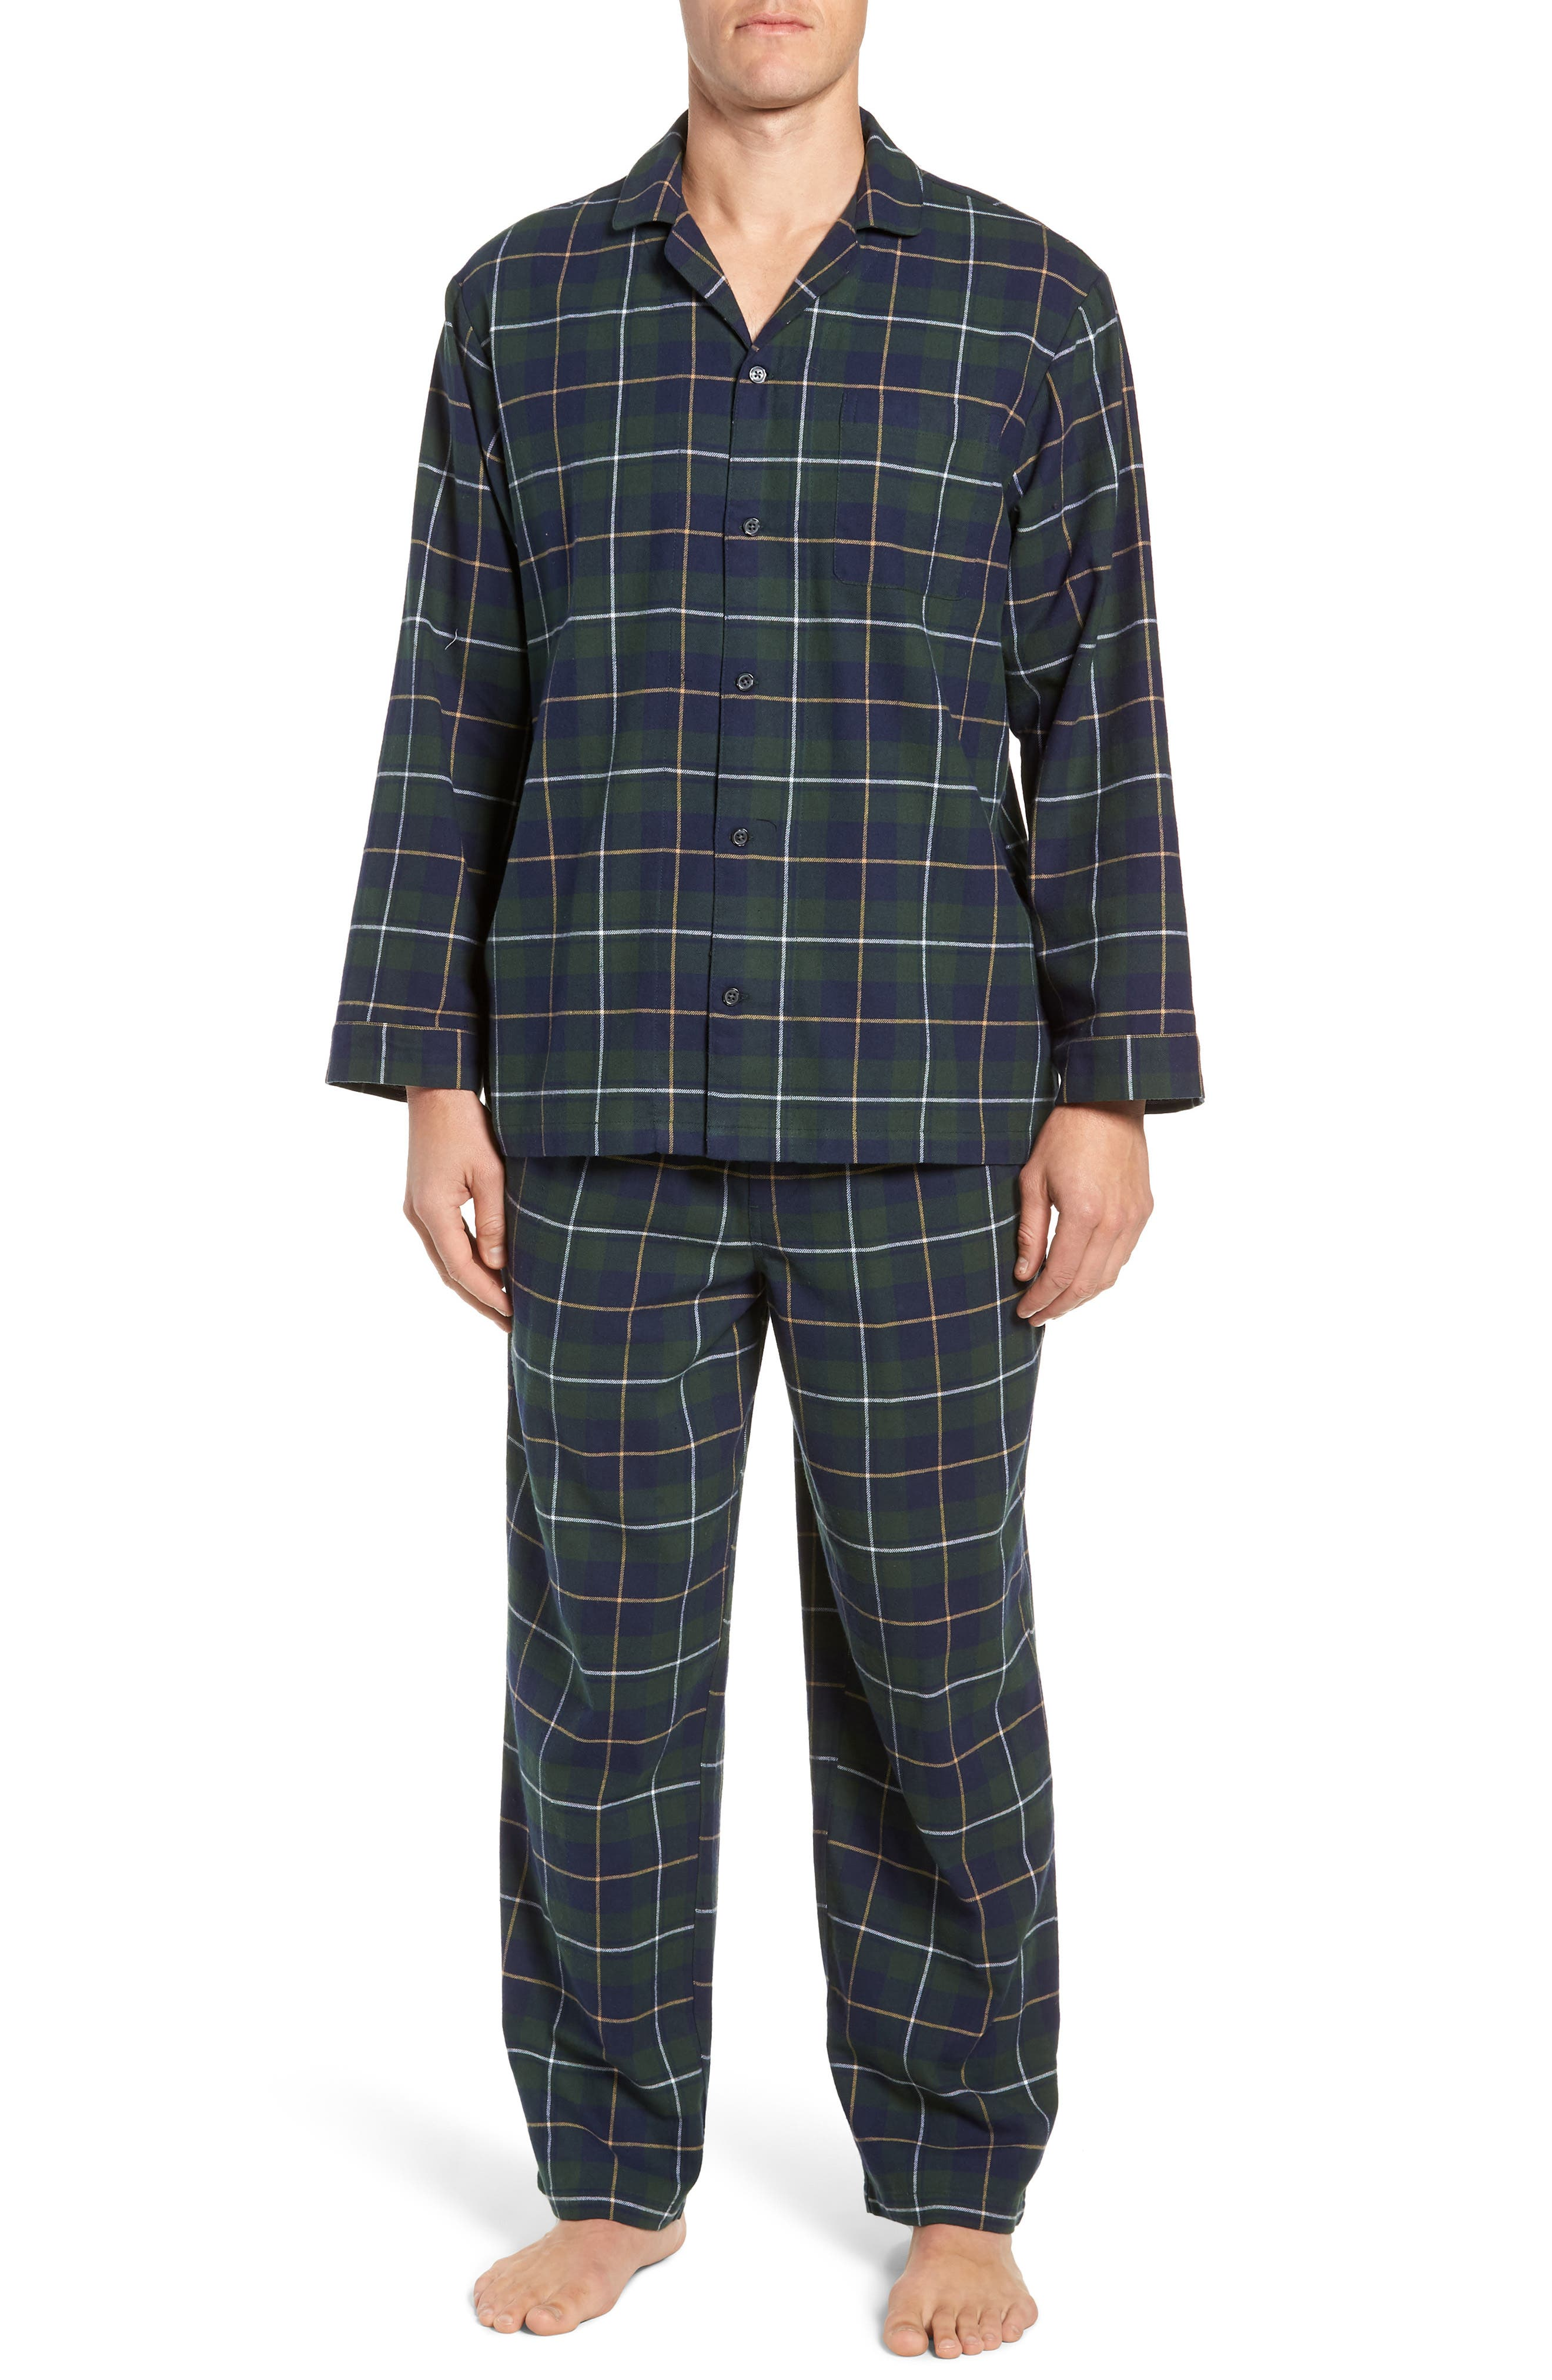 '824' Flannel Pajama Set,                             Main thumbnail 1, color,                             GREEN CHARCOAL FADED PLAID